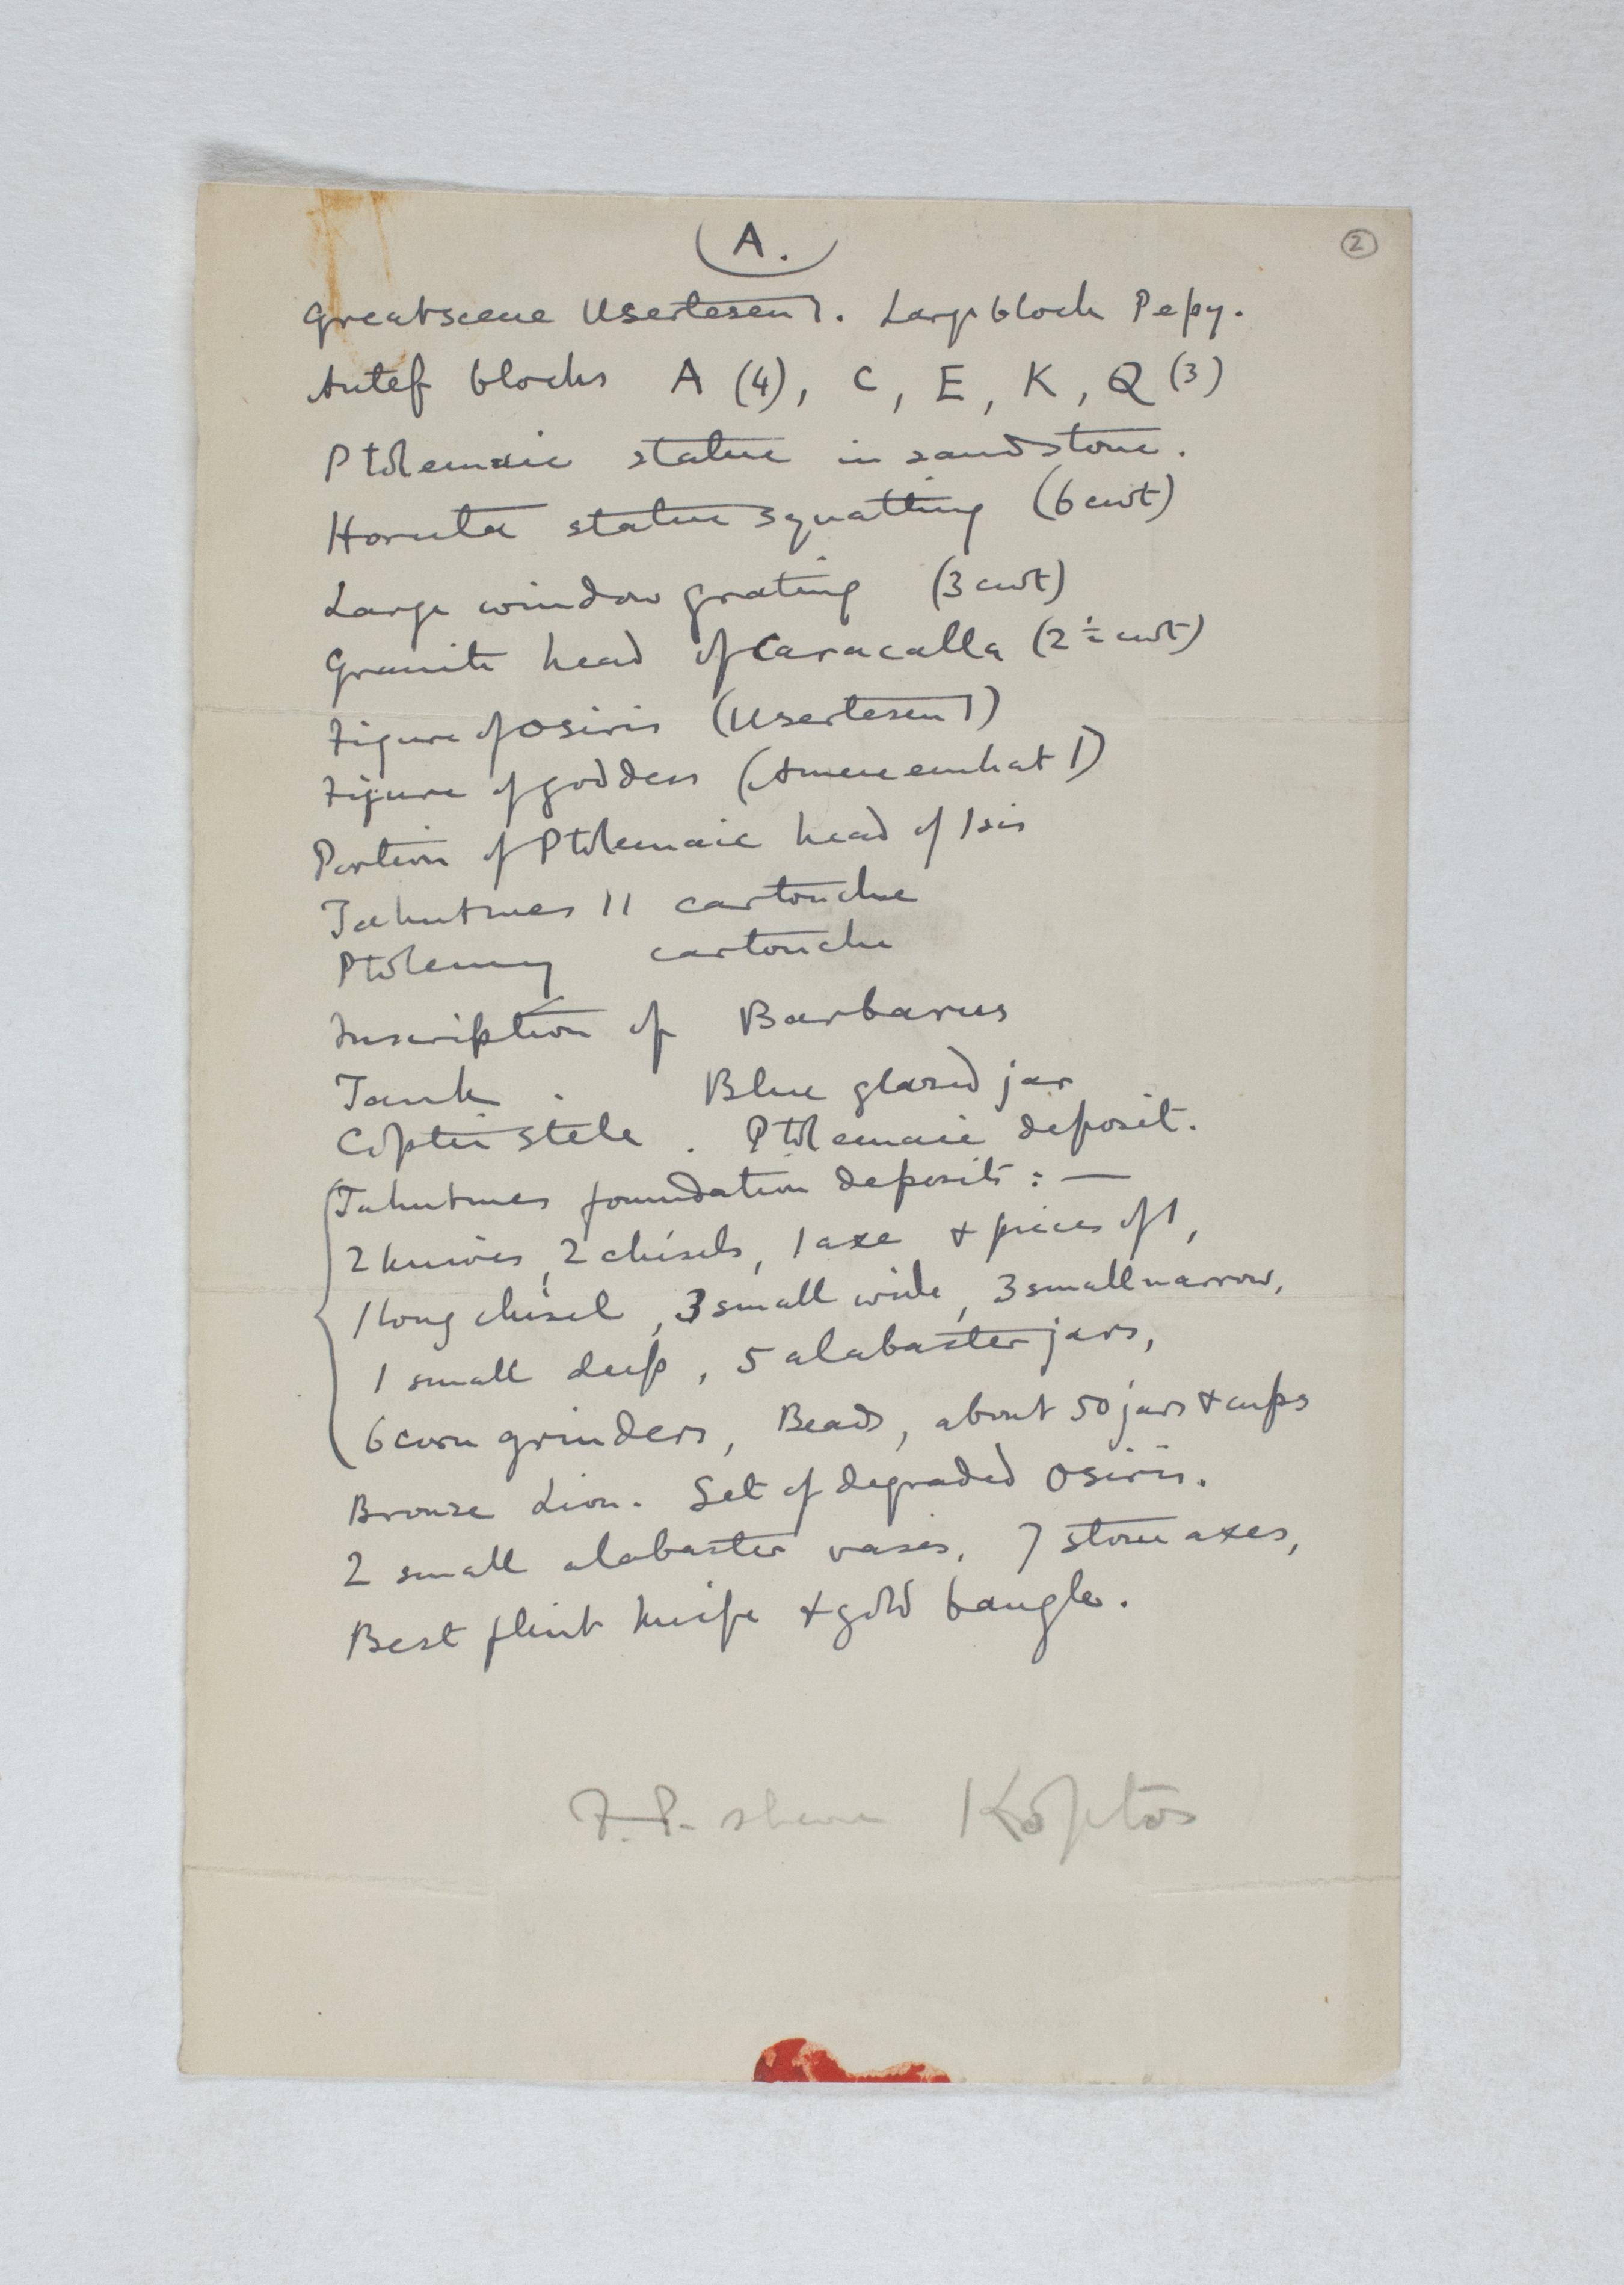 Koptos 1983-1894, Object List, PMA/WFP1/D/2/2.1